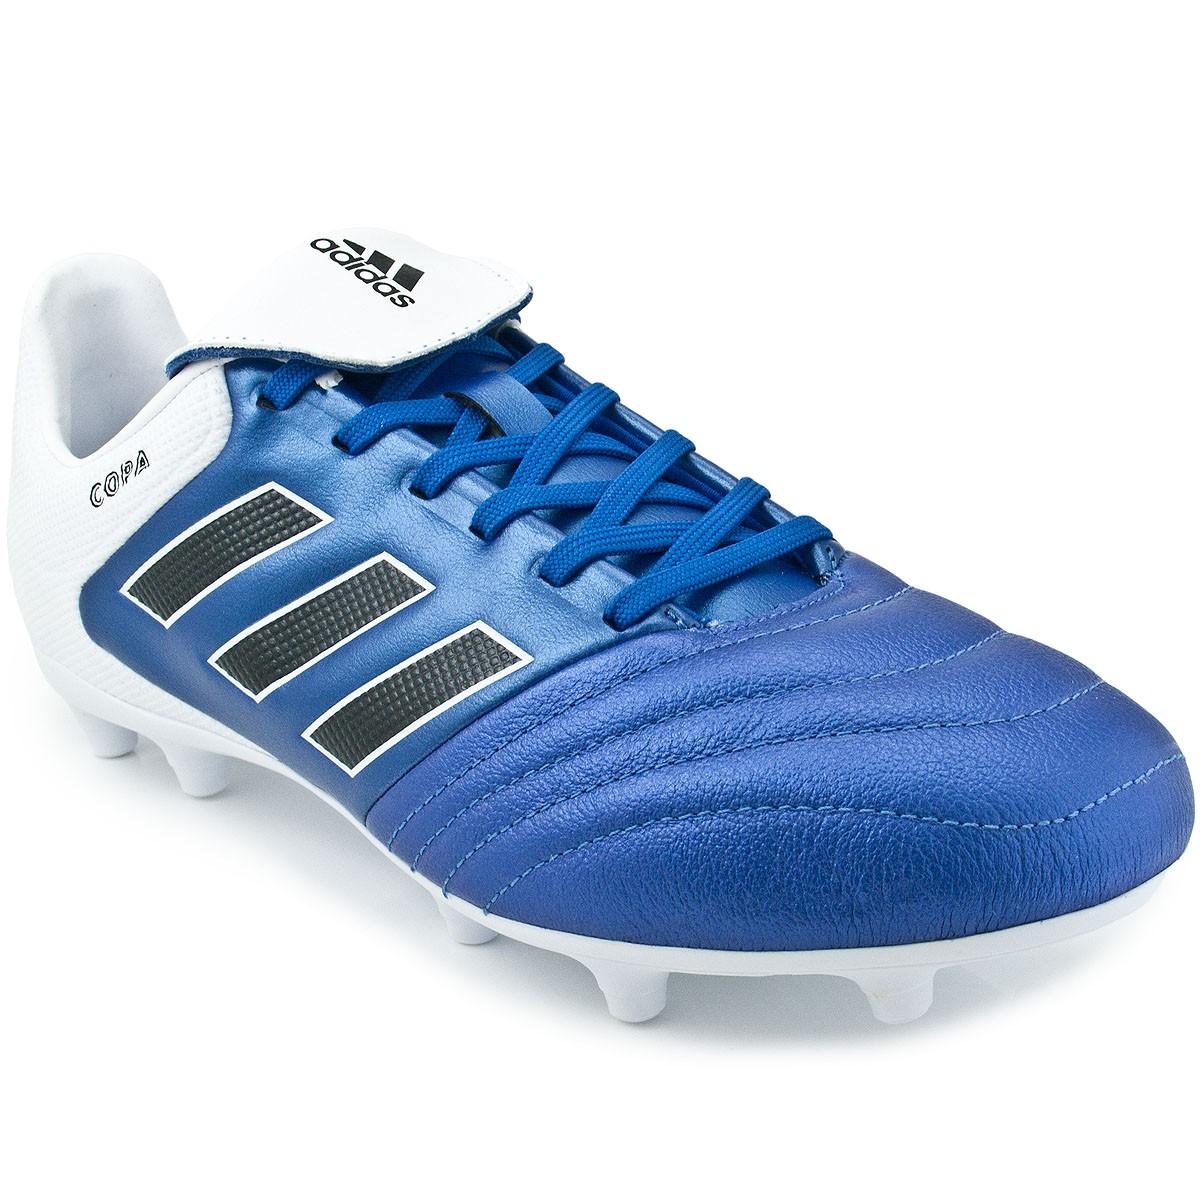 Chuteira Adidas Copa 17.3 FG  b3cce51a2ec07